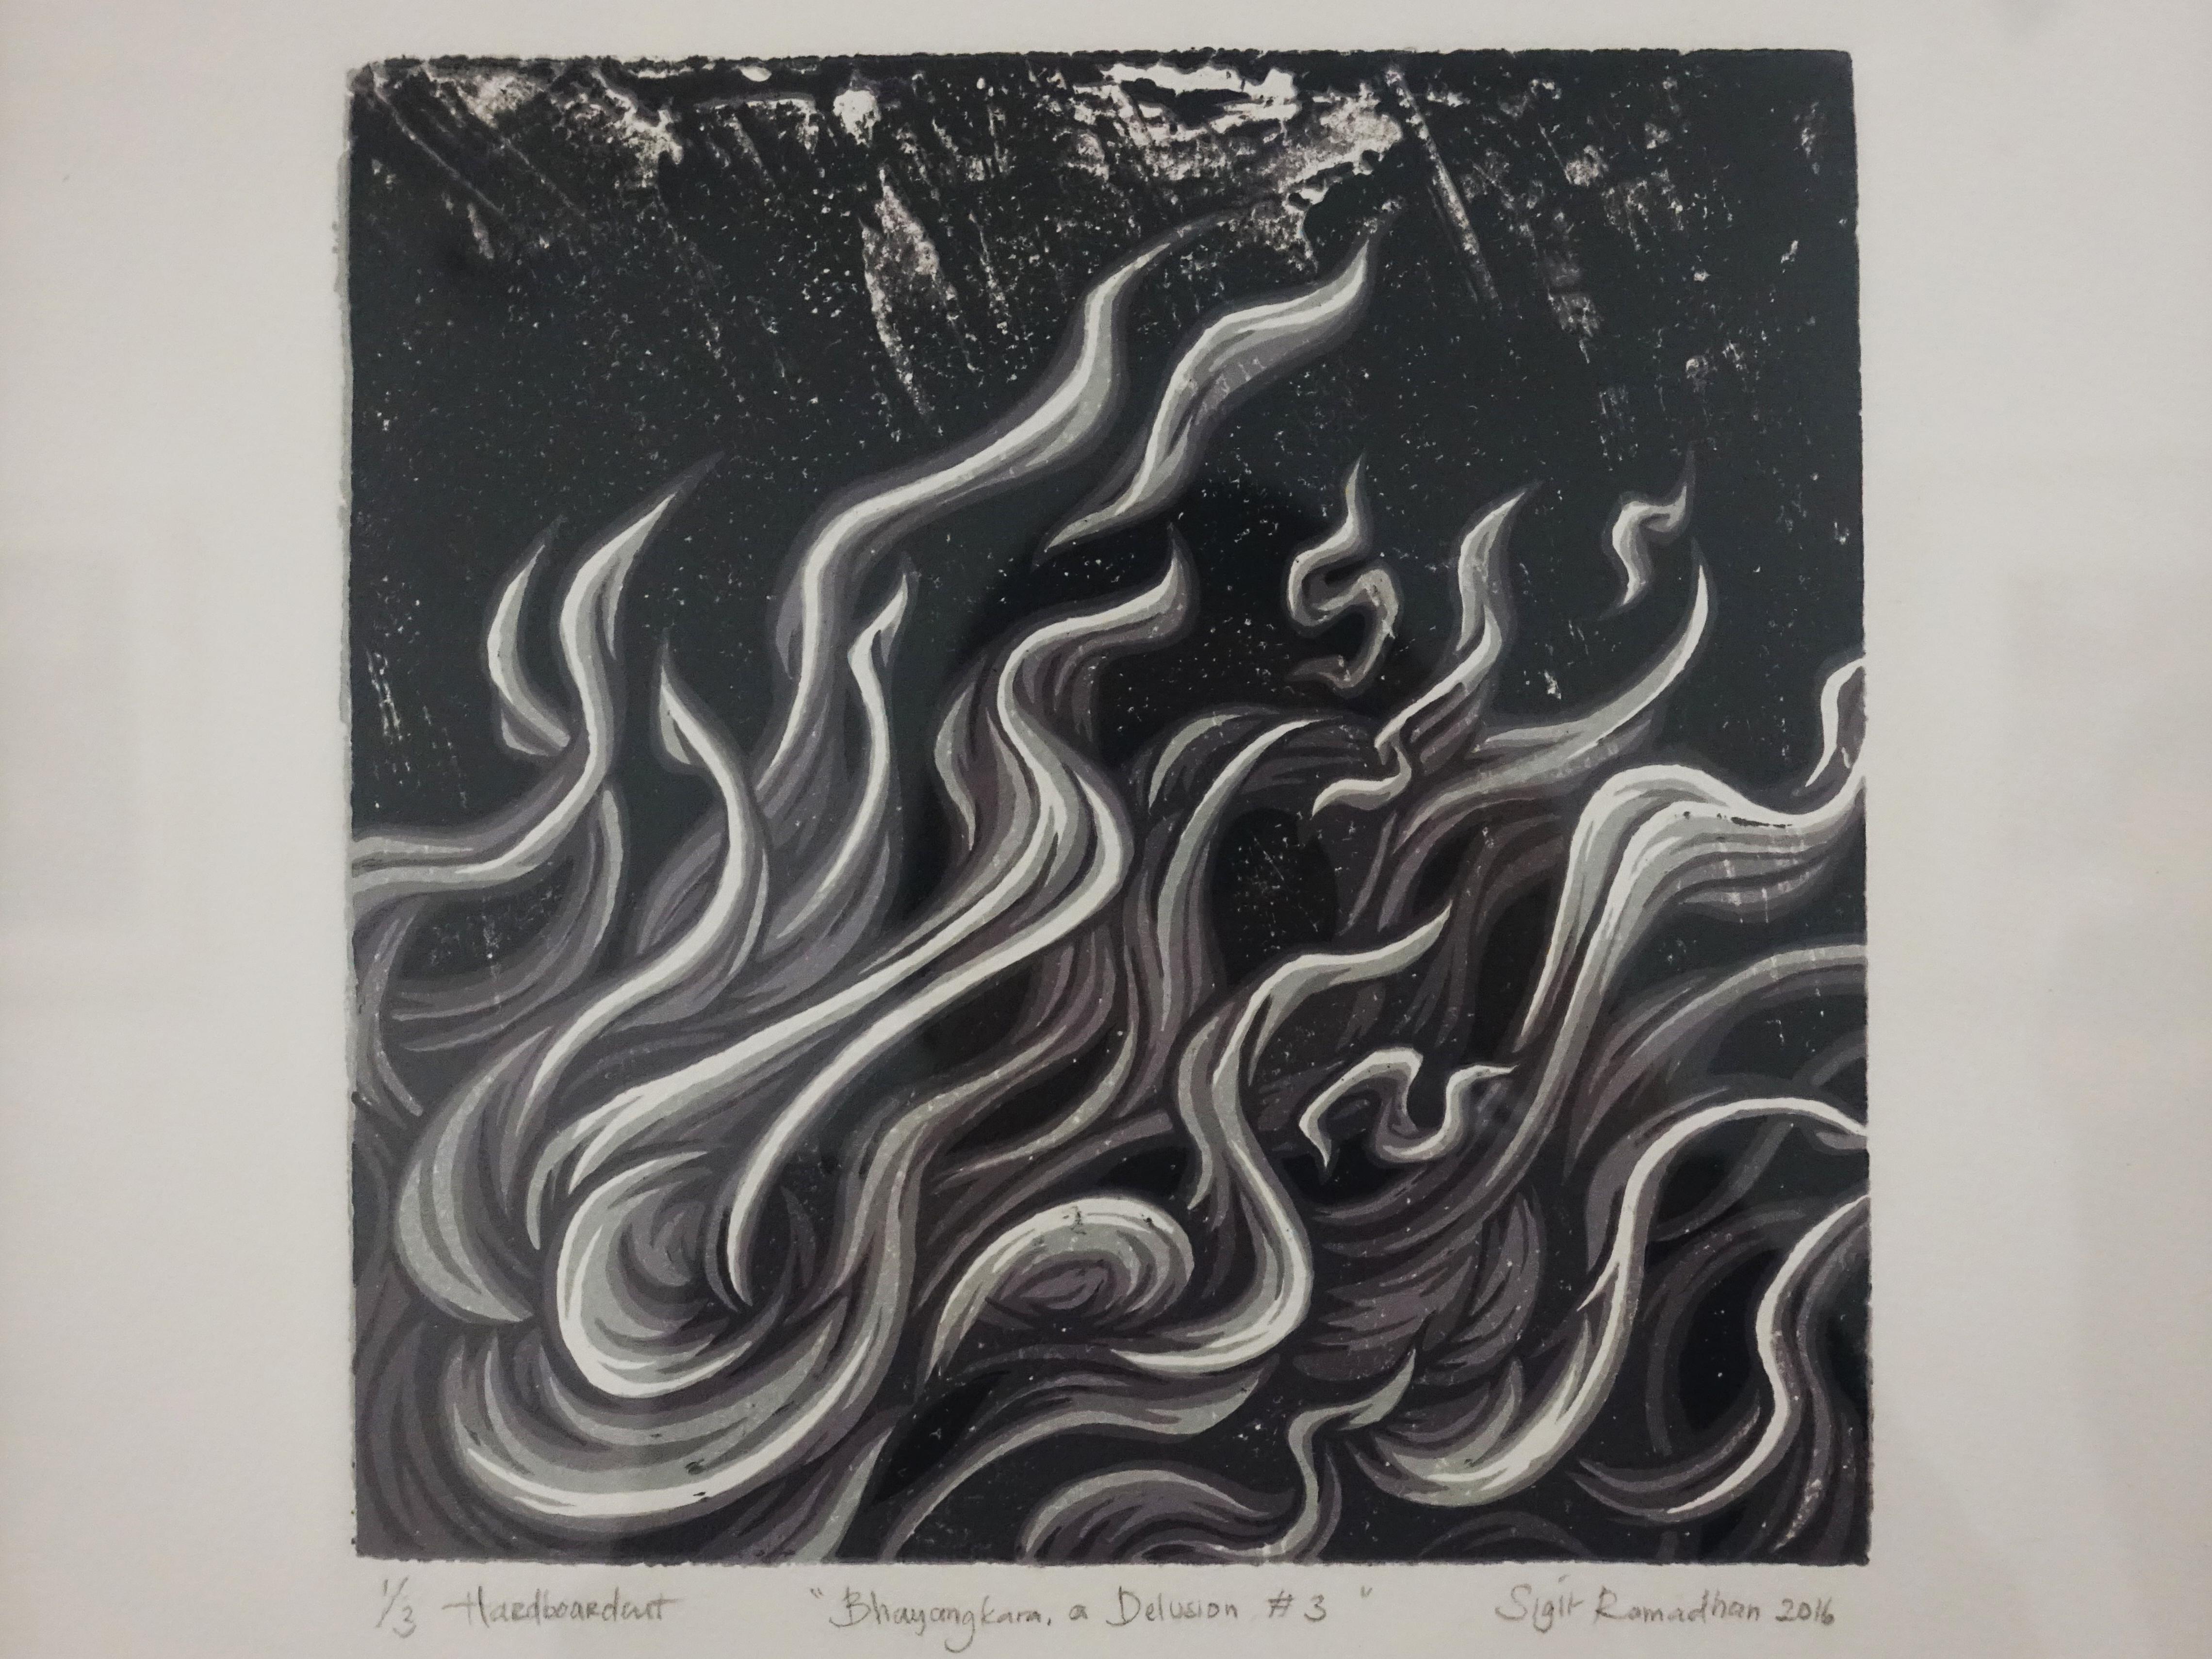 Sigit Ramadhan,《Bhayangkara,a Delusion#3》,30 x 30 cm x5,Reduction hardboardcut print on paper3/3,2016。